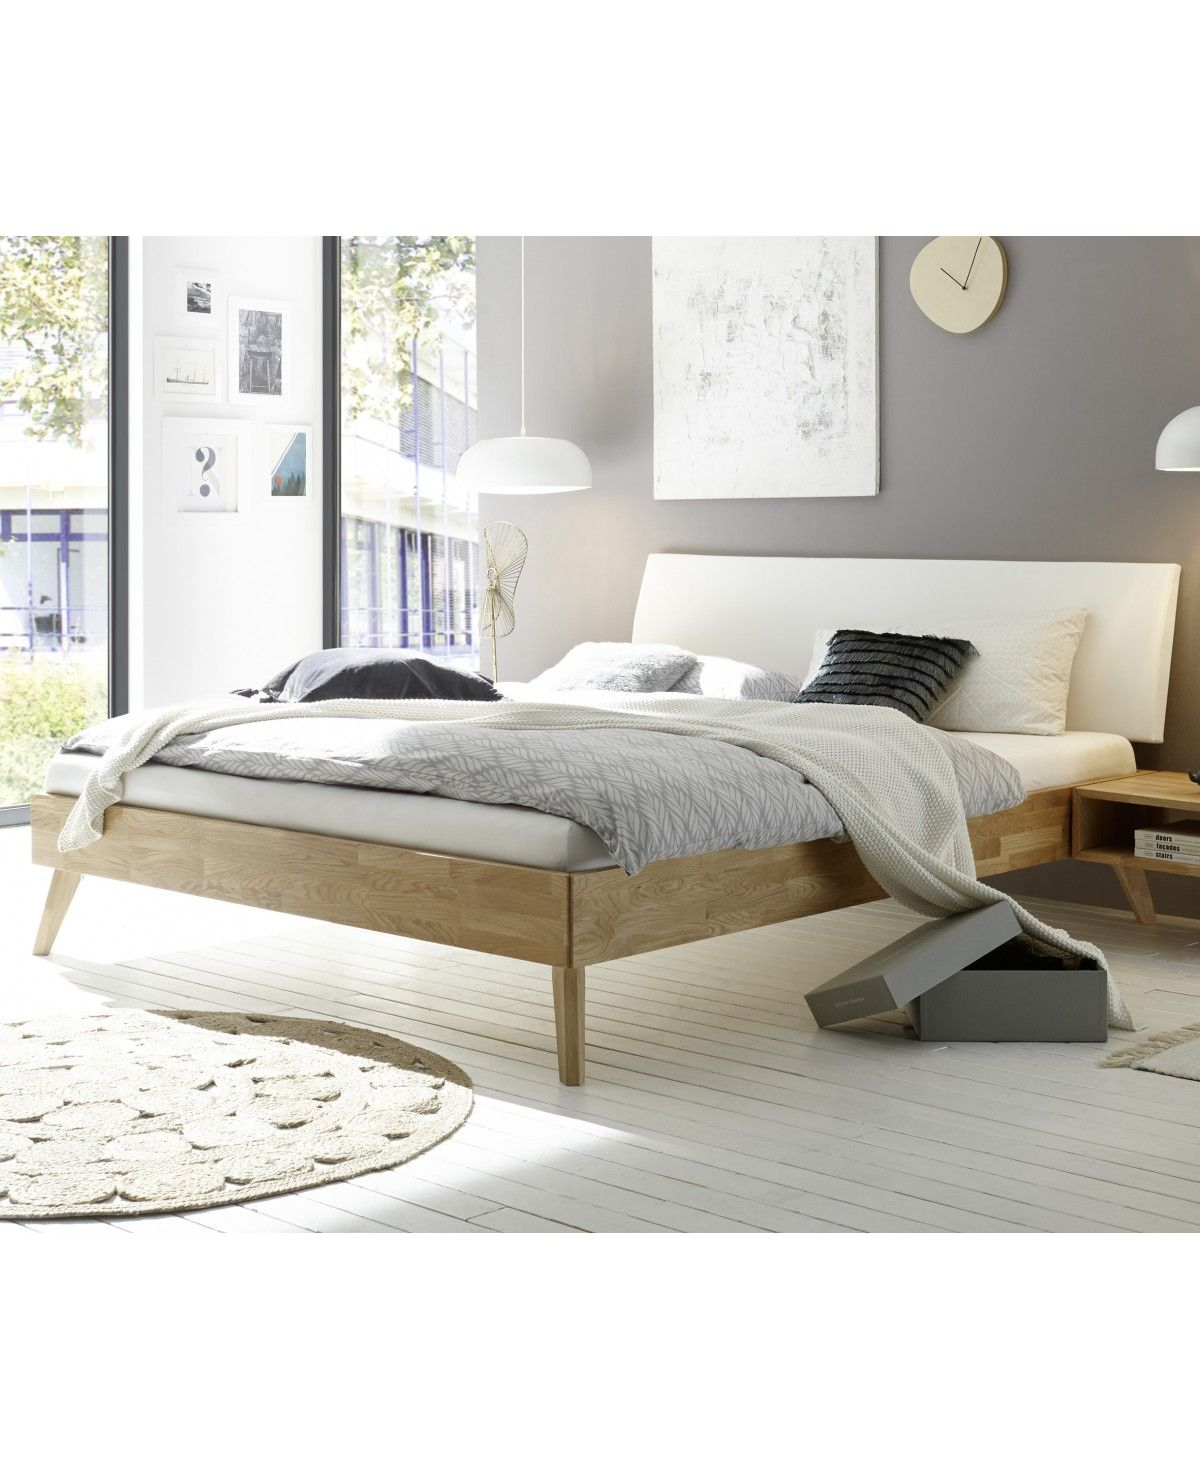 hasena fine line eiche bianco bett pesaro kopfteil lecco wei 160x200. Black Bedroom Furniture Sets. Home Design Ideas